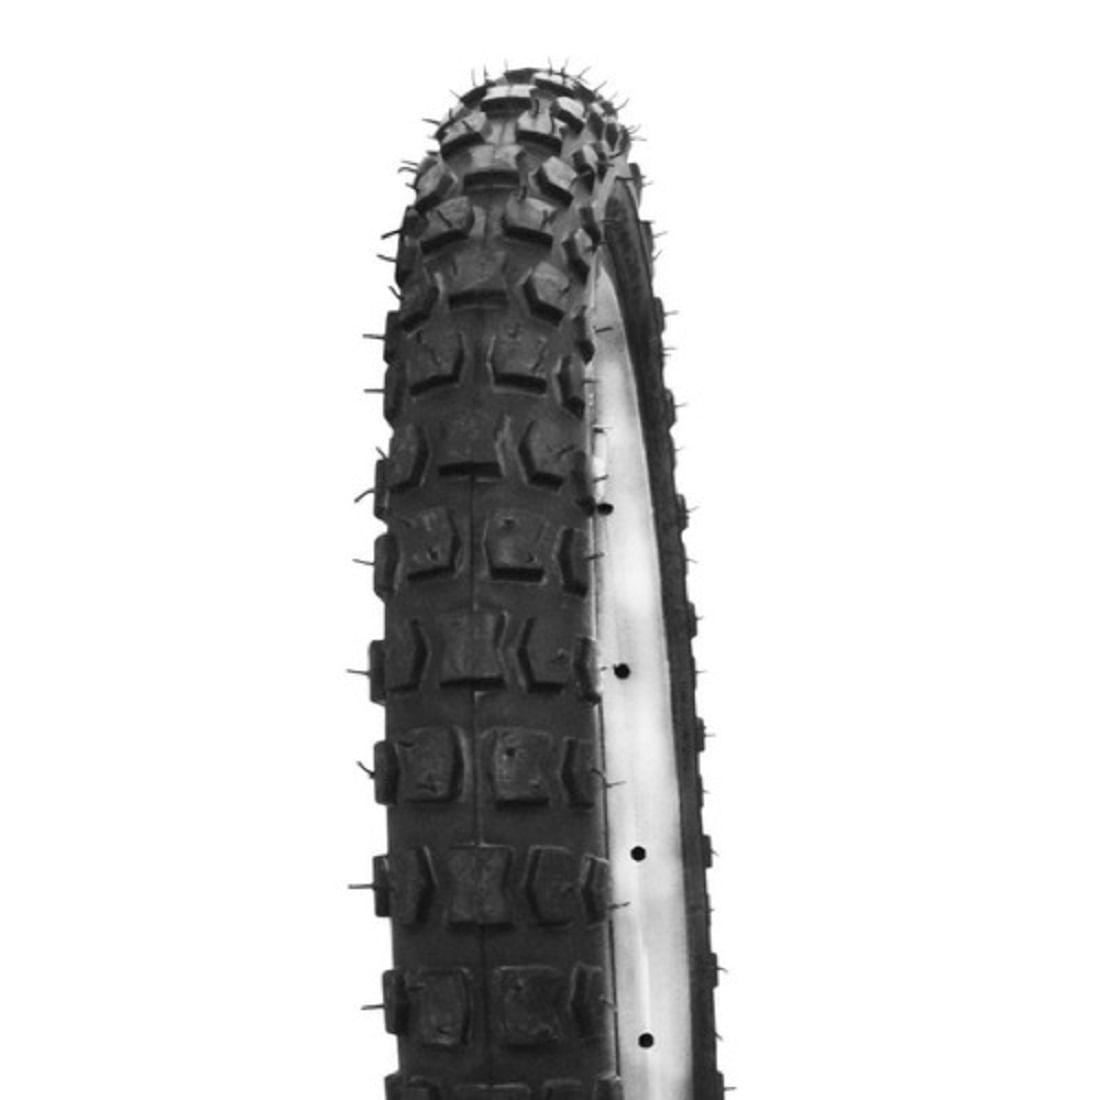 Pneu-de-Bicicleta-Aro-16-x-1.75-Kenda-Motocross-47-305-K-44---9884--1-